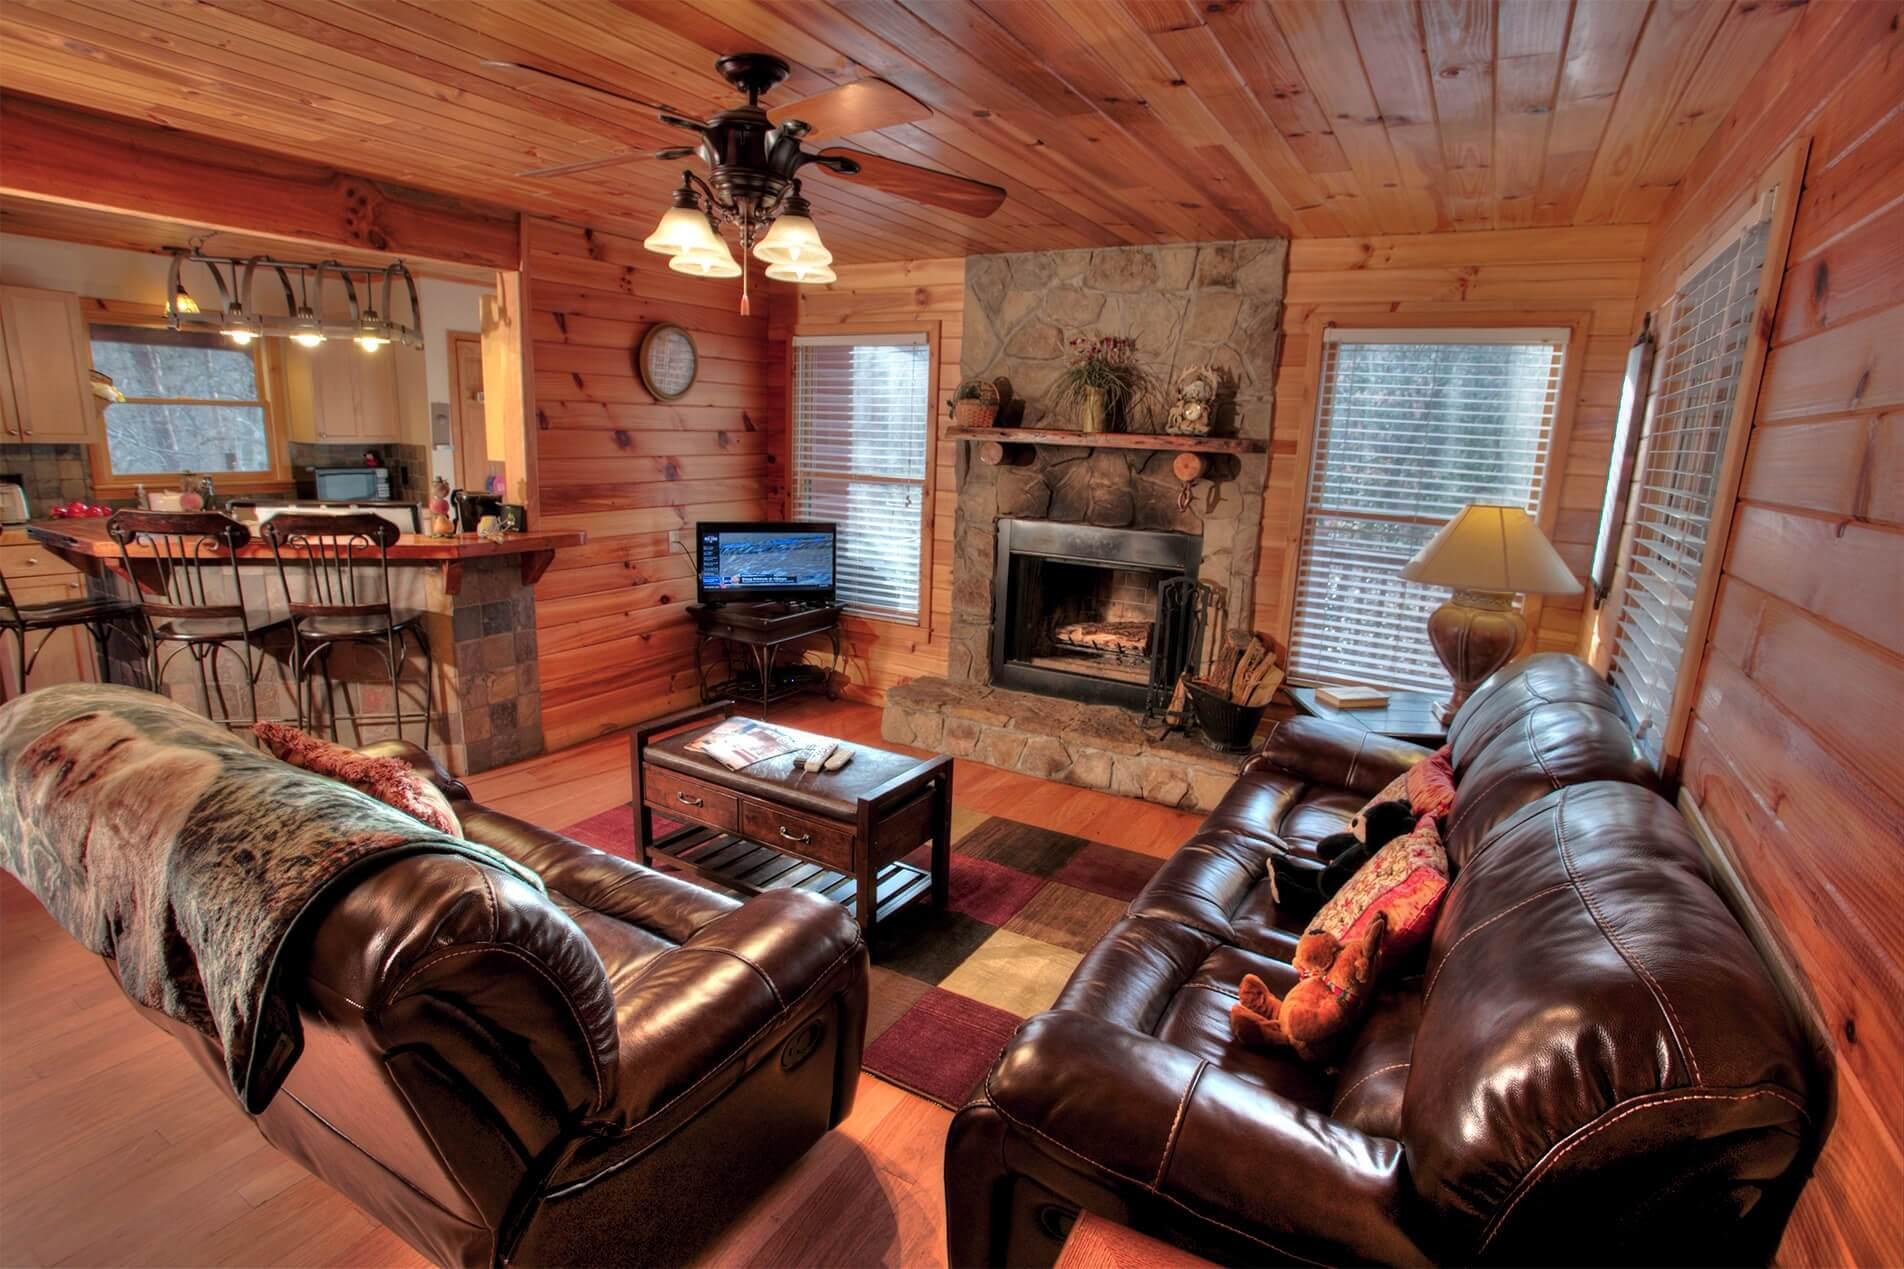 helen min ha sautee ga antler peak from luxury vacation property cabin in a cabins